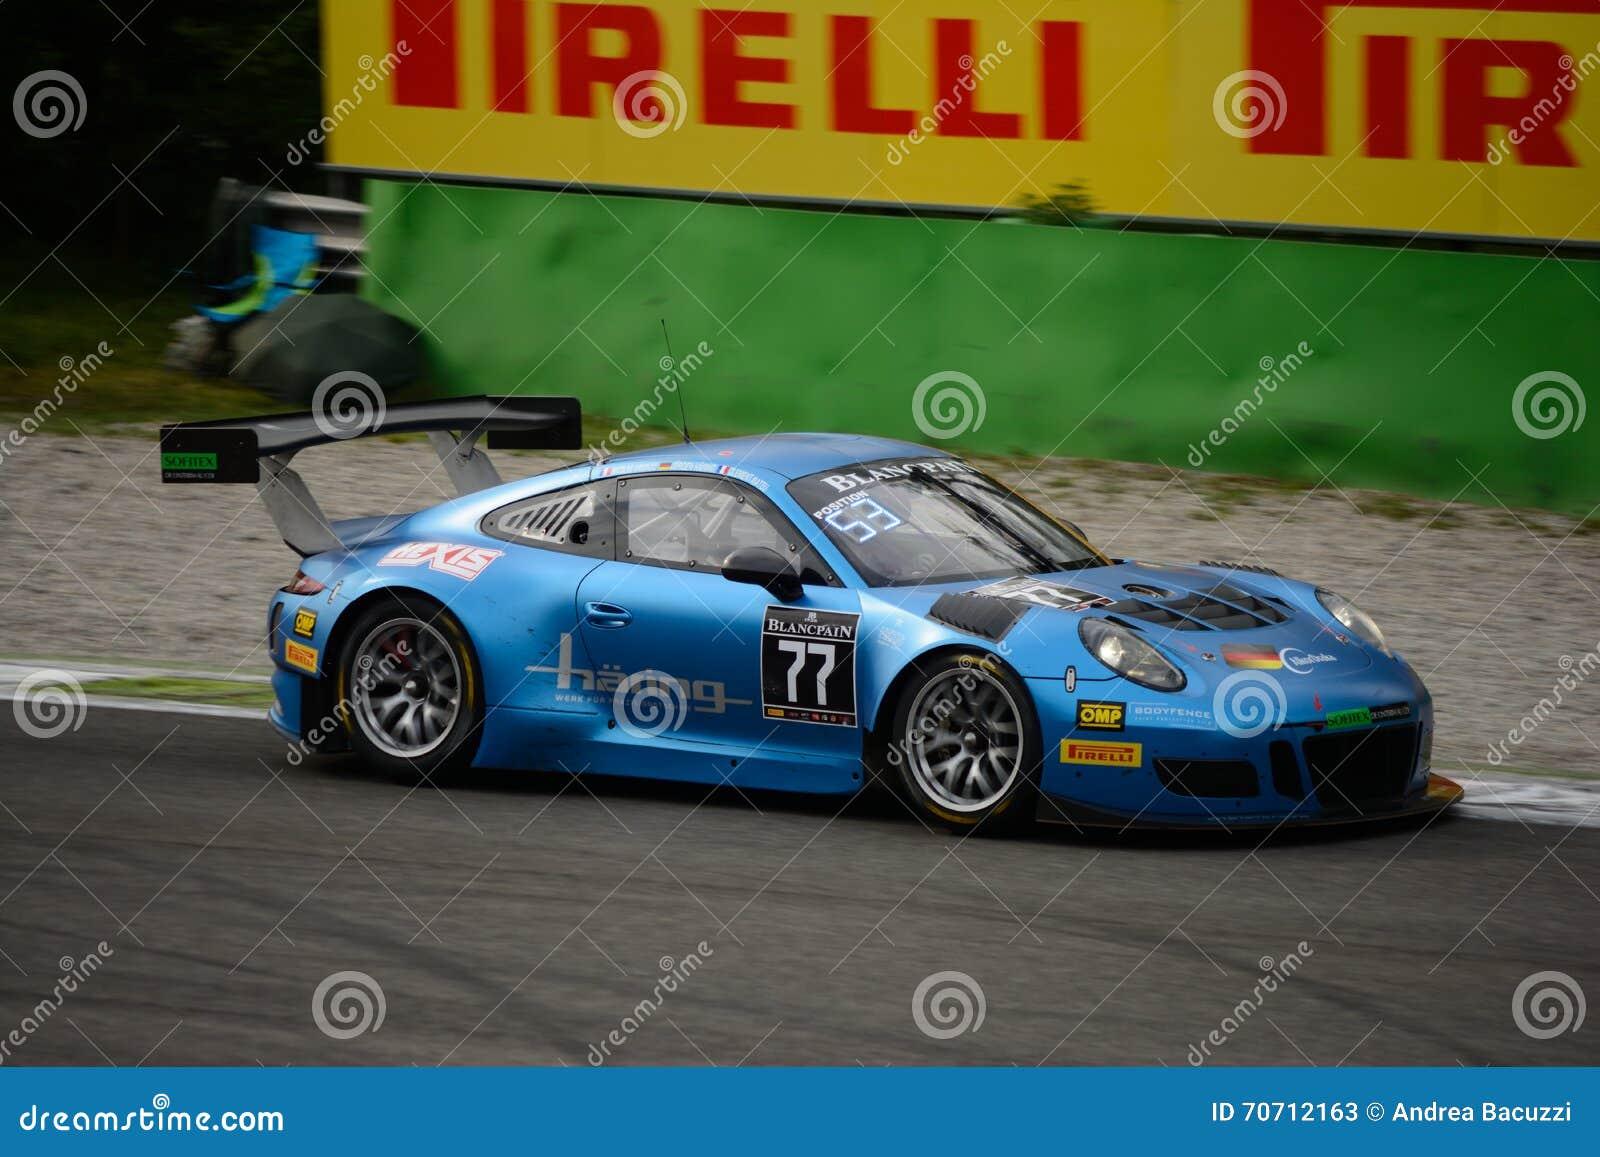 Serie Porsche Di Blancpain GT 911 GT3 R Che Corre A Monza